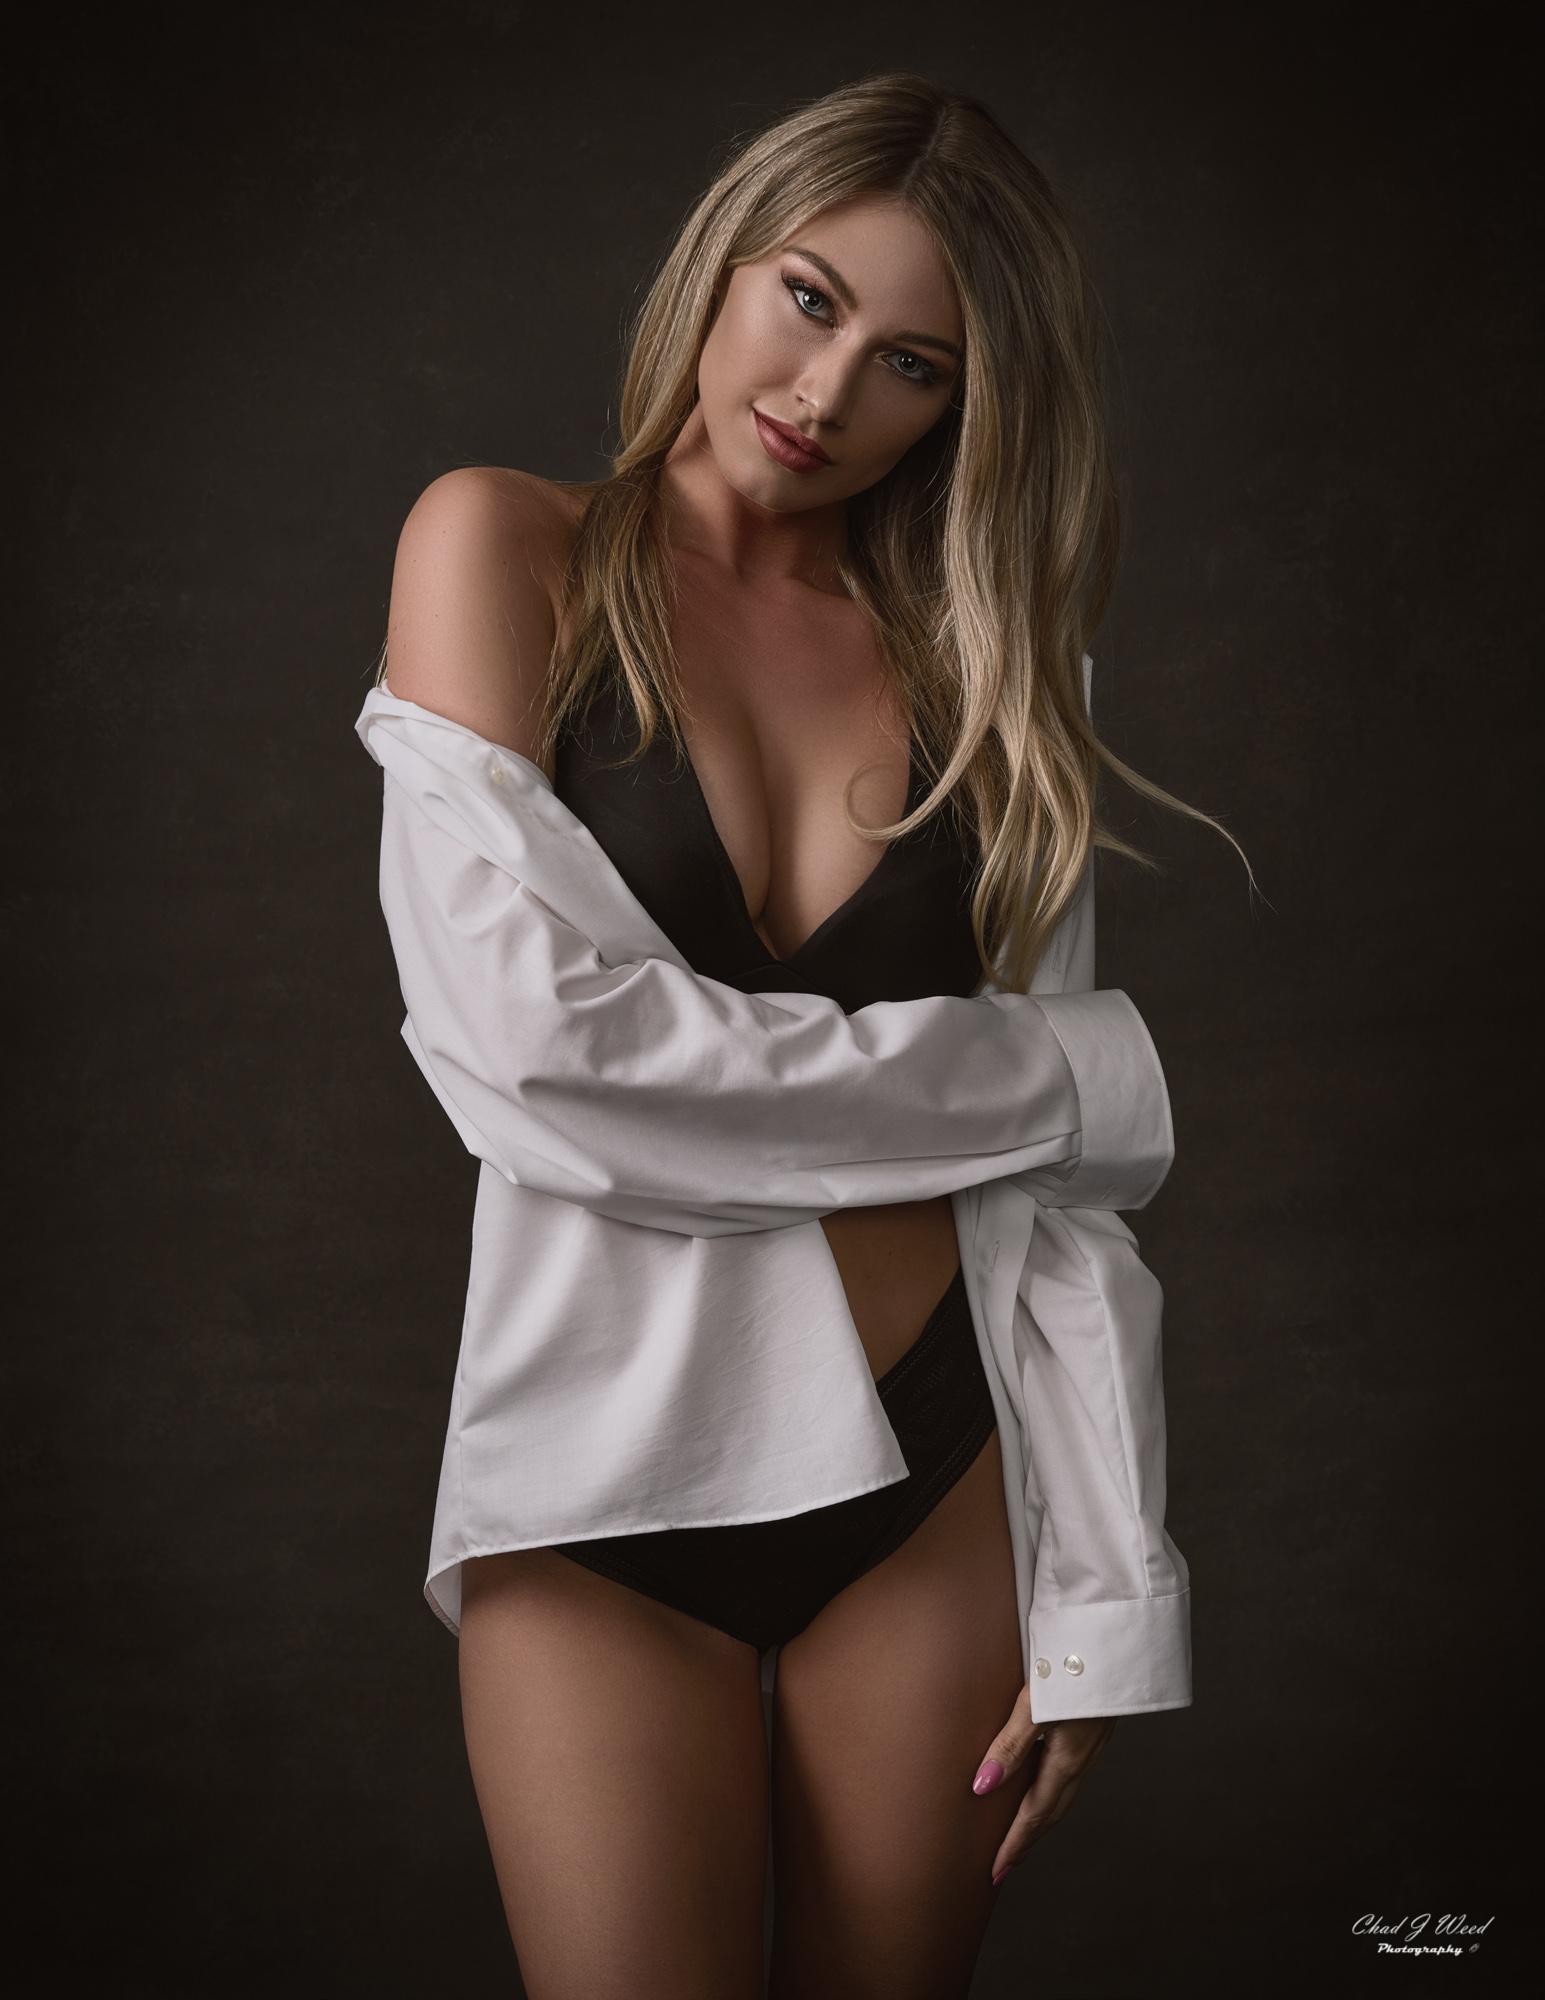 Arizona Portrait Photographer Chad Weed - Fashion Model Brittany